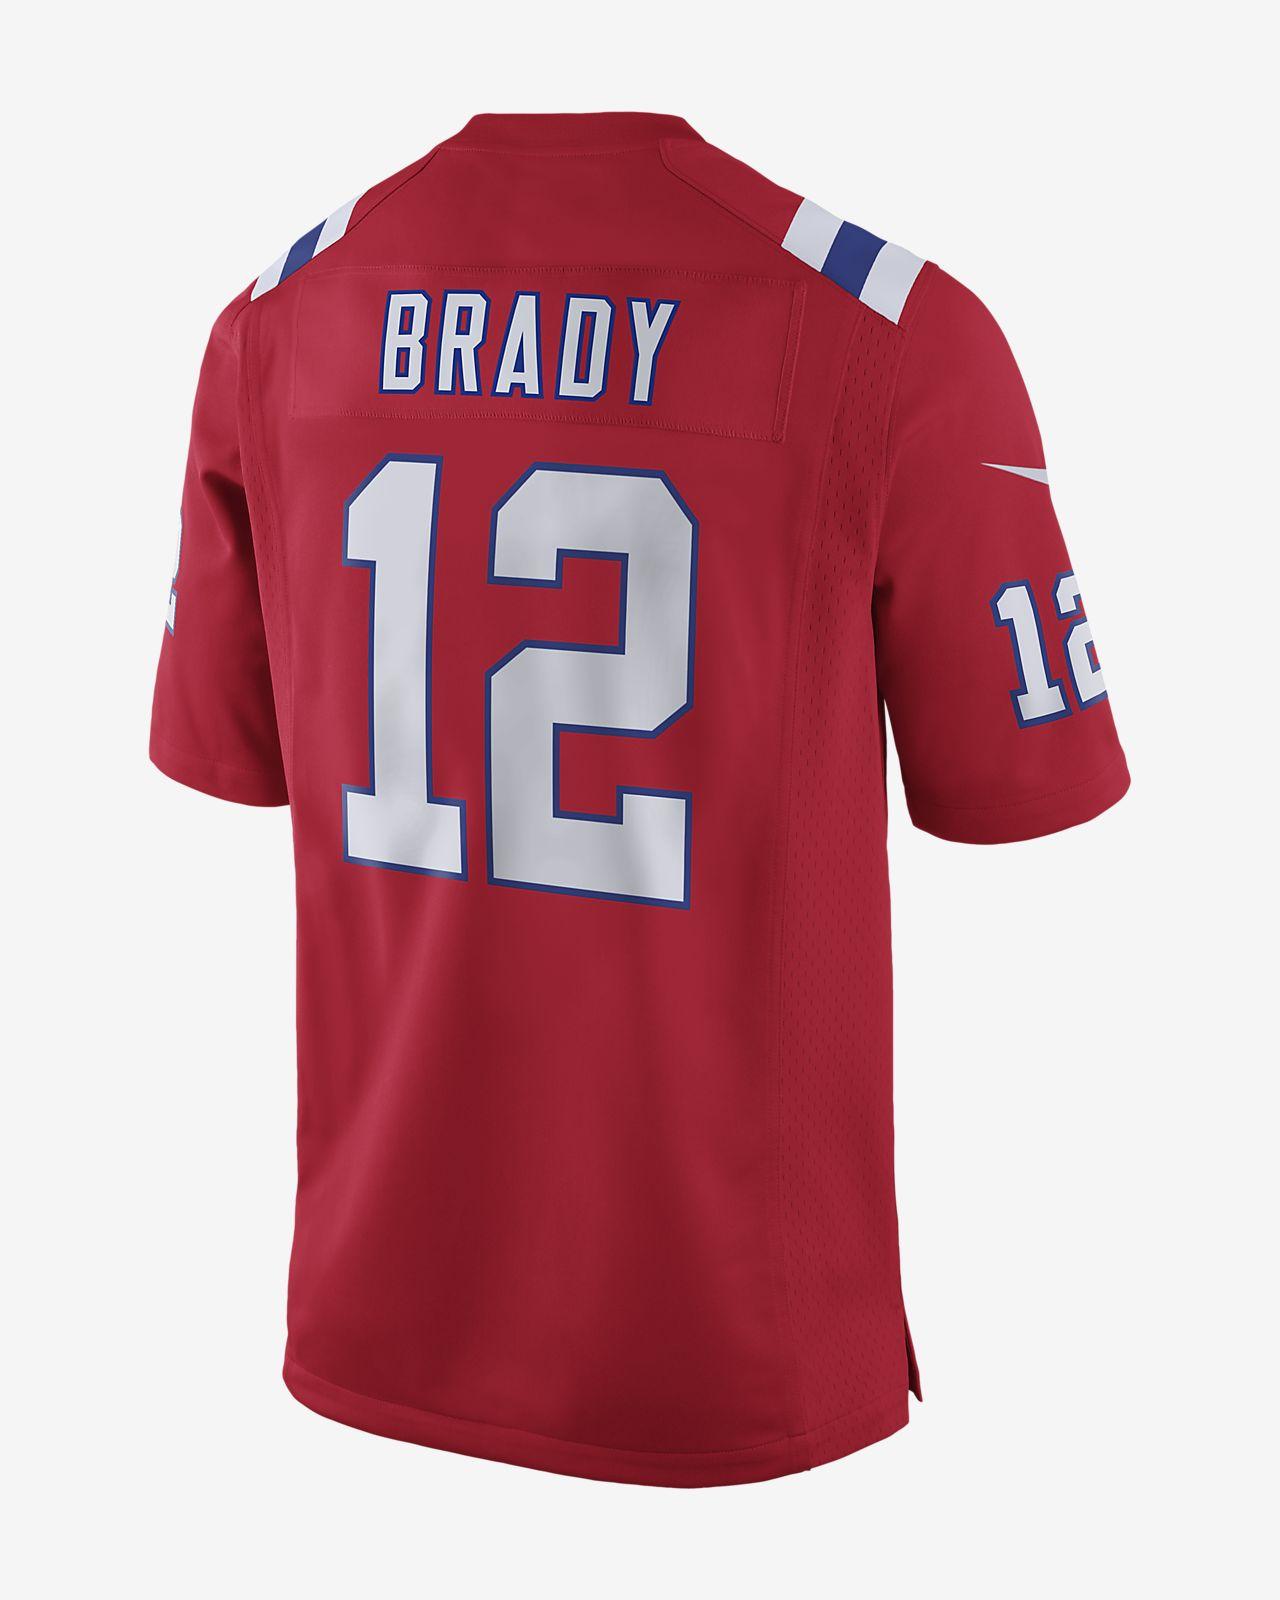 a348fe51 NFL New England Patriots Super Bowl LIII (Tom Brady) Men's Game Football  Jersey